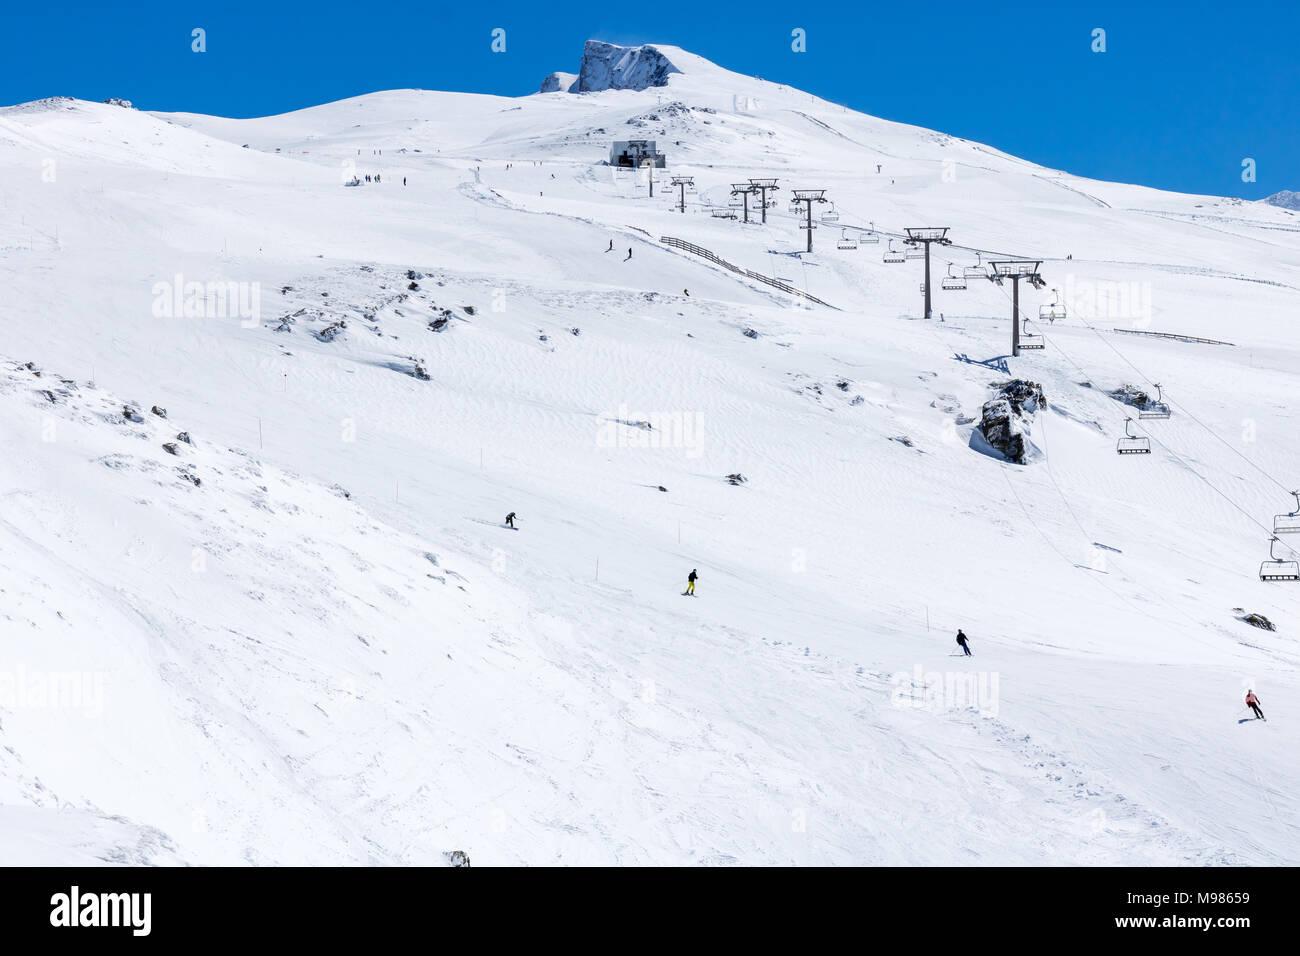 Sierra Nevada ski resort. People practicing snow sports. - Stock Image